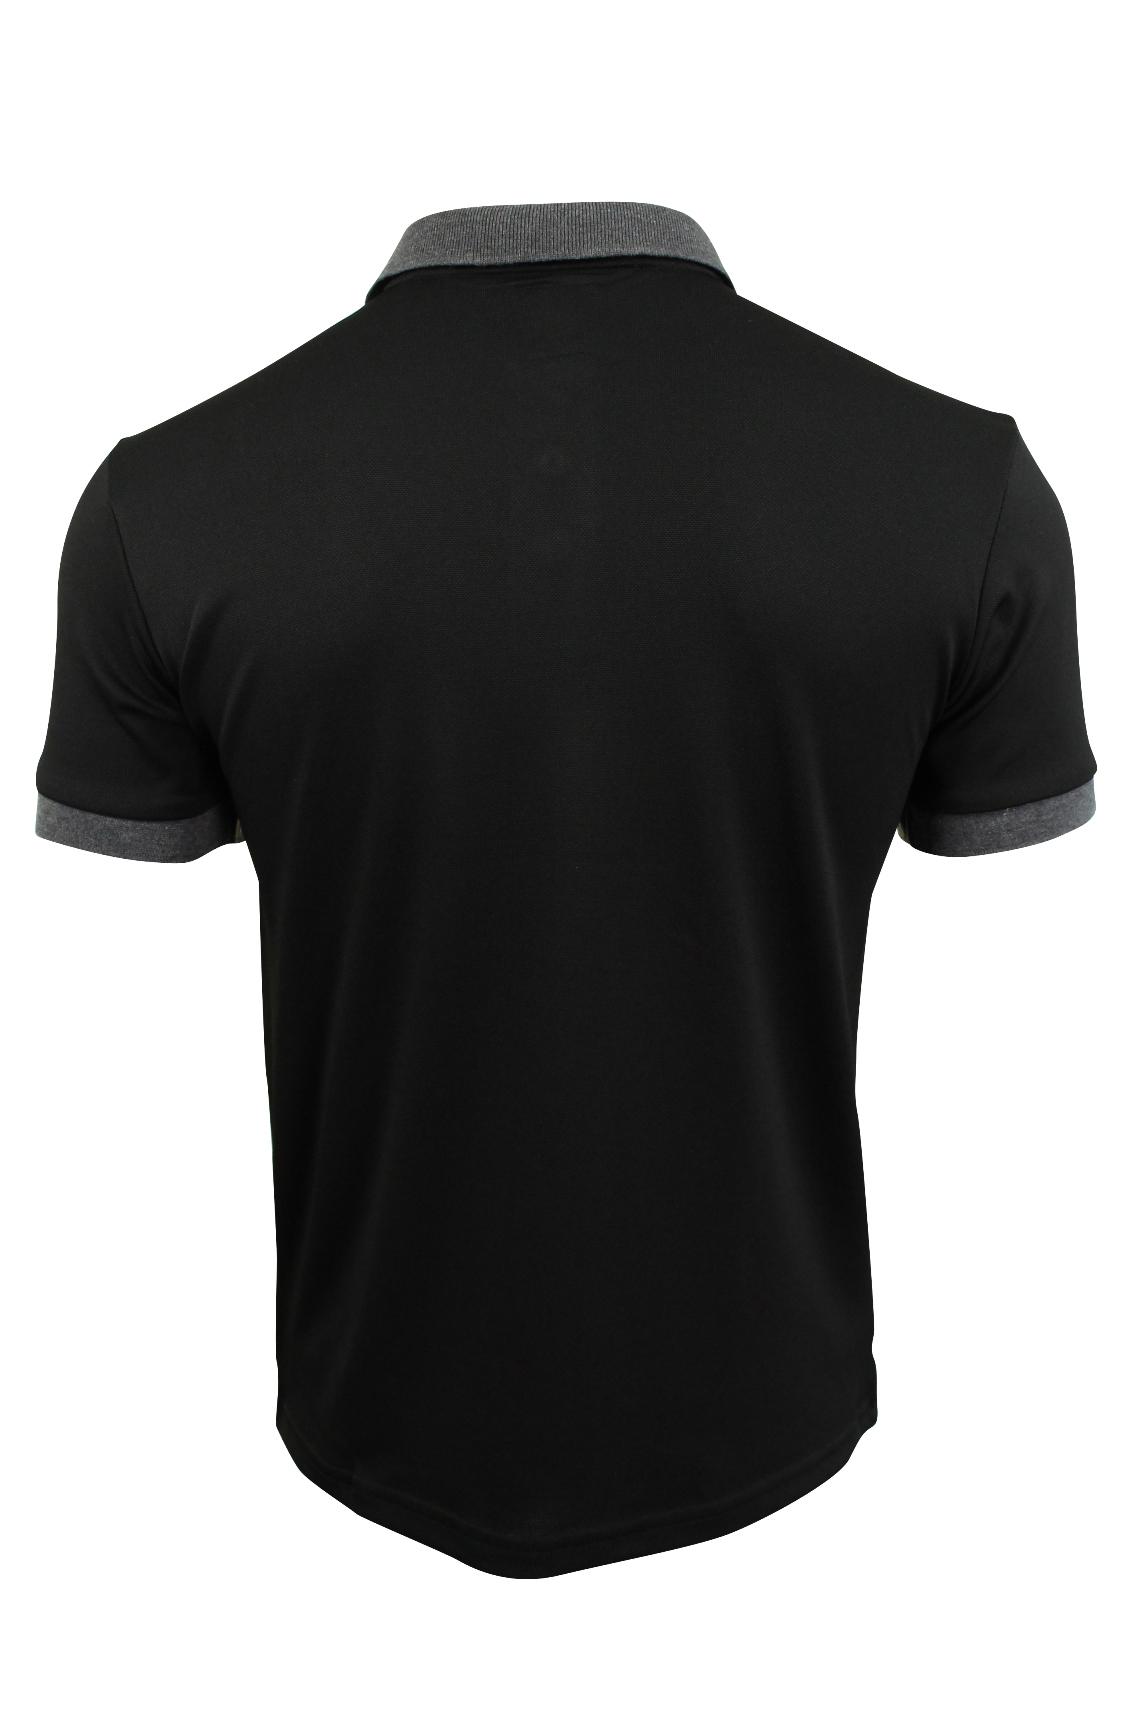 Mens-Polo-T-Shirt-by-D-Rock-Short-Sleeved thumbnail 5